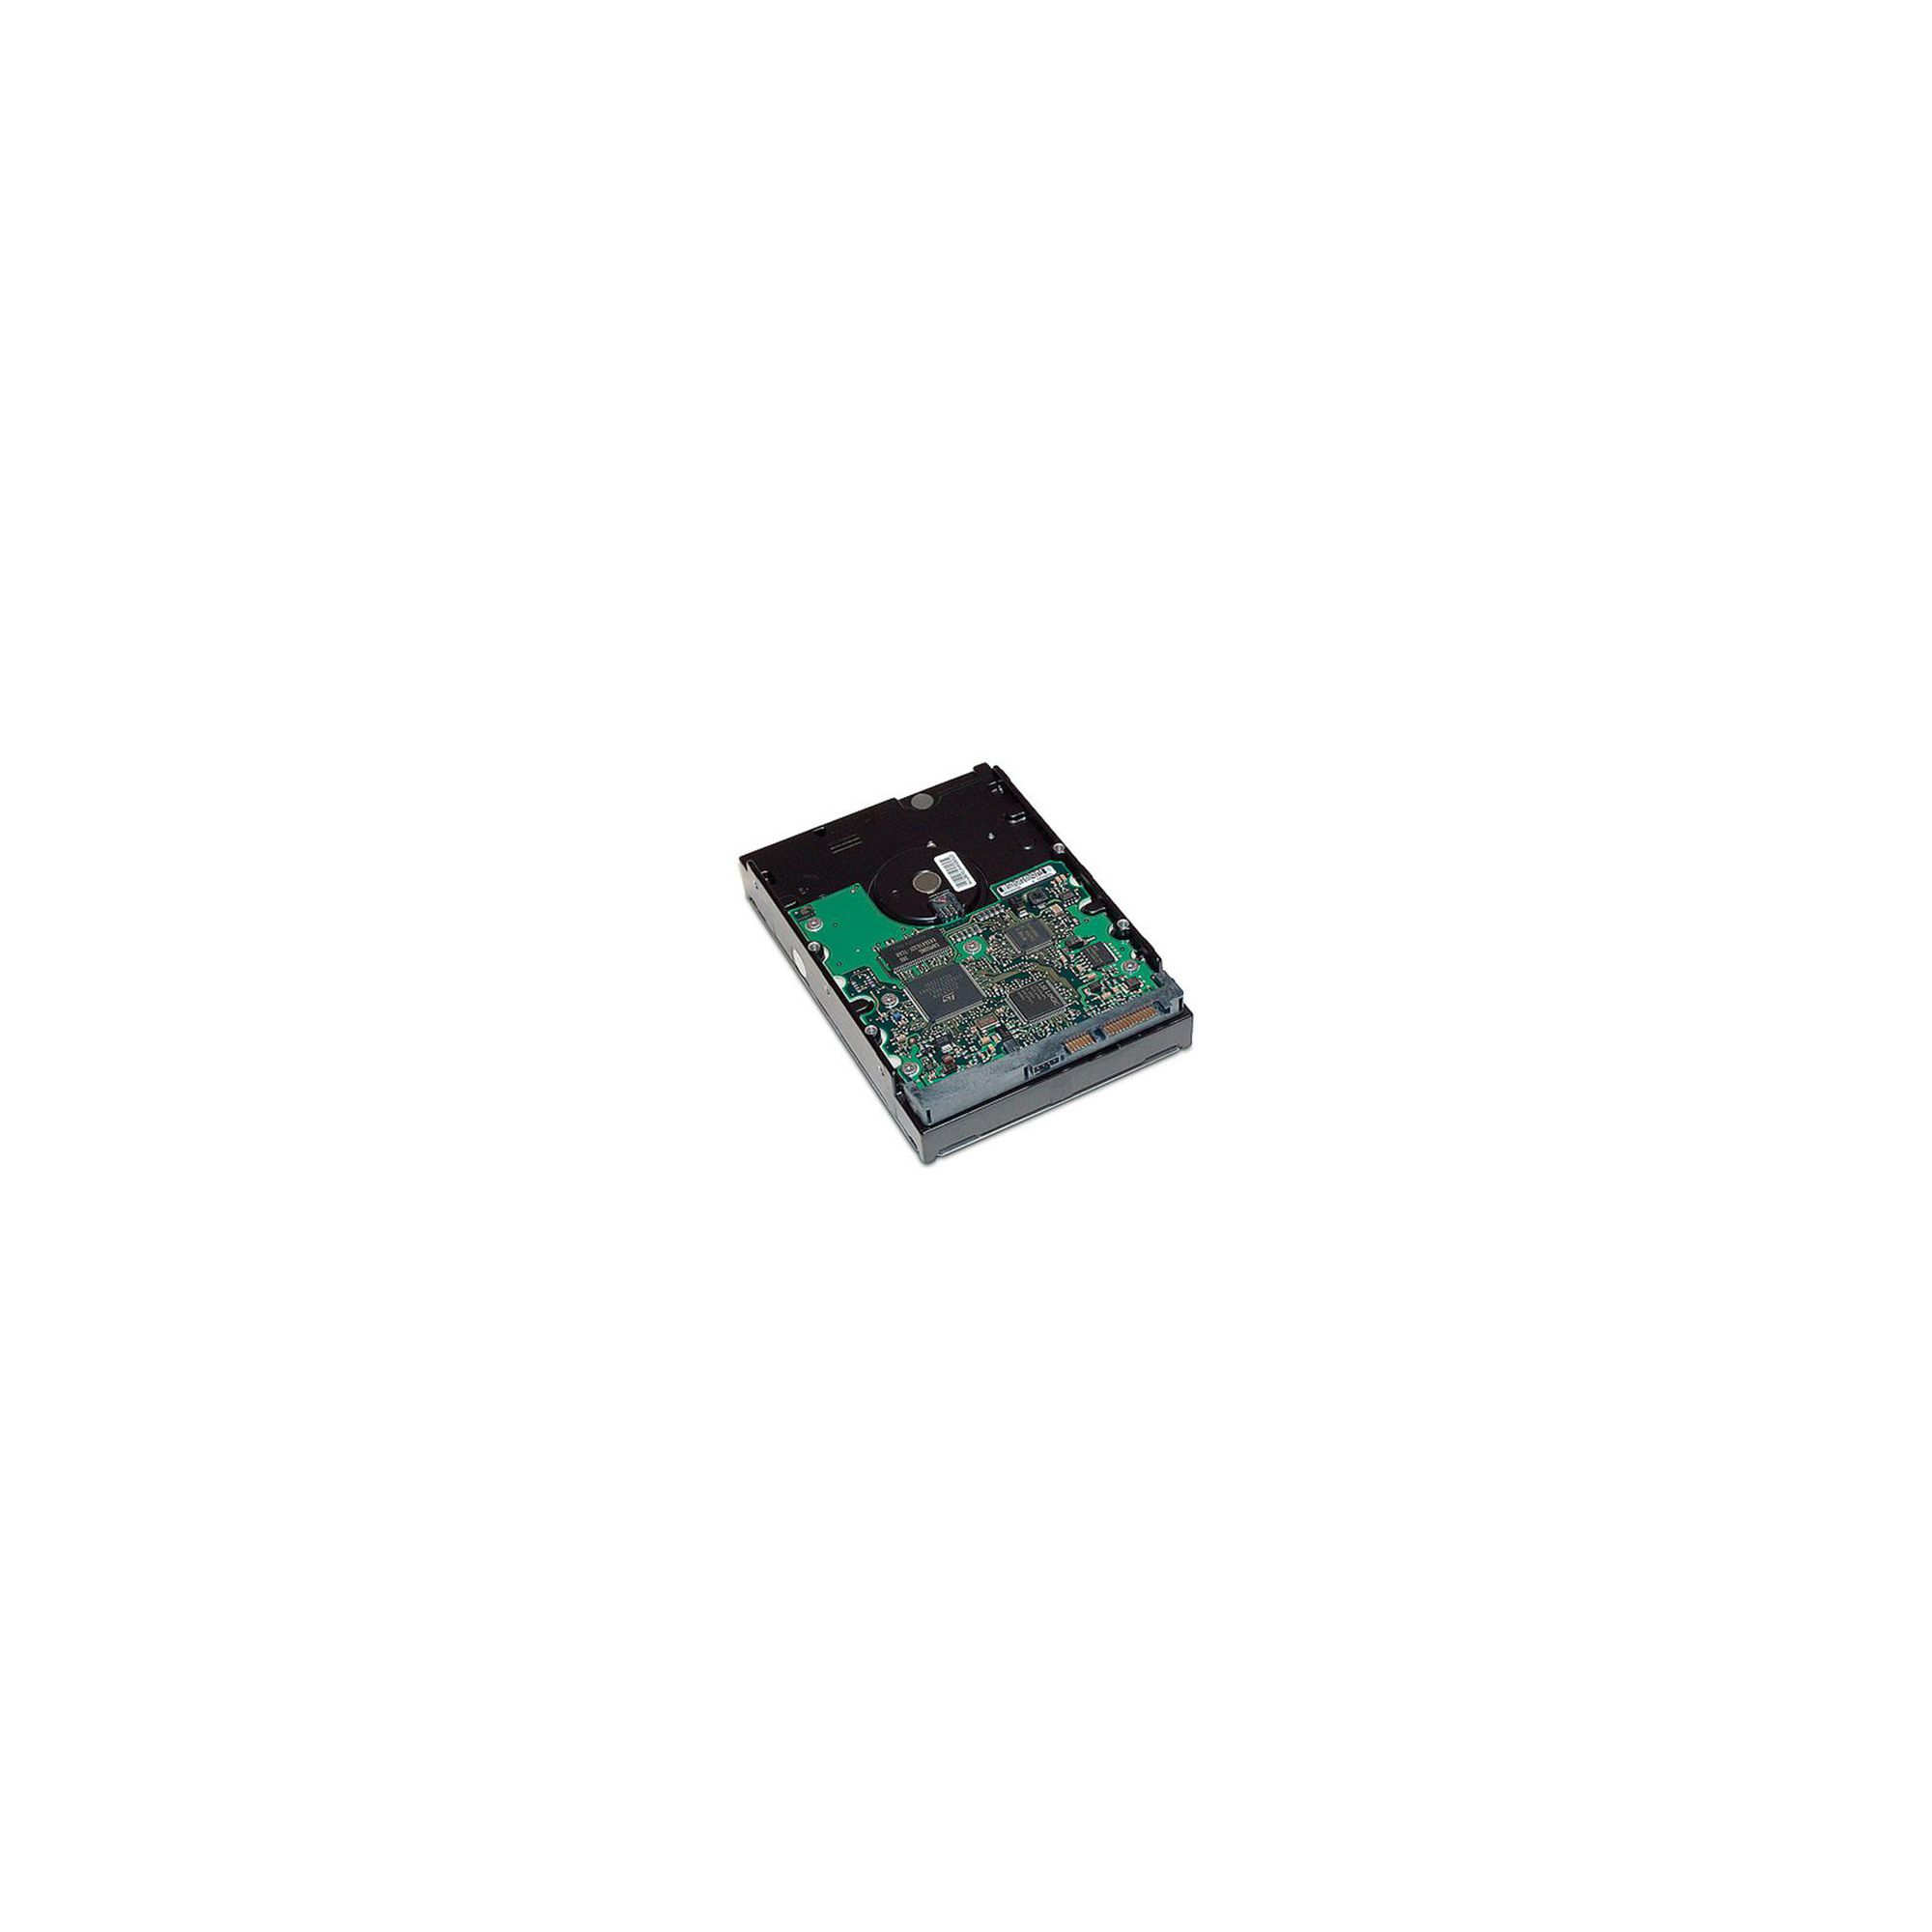 Hewlett-Packard WE464AA 2TB SATA 7200RPM Hard Disk Drive at Tesco Direct